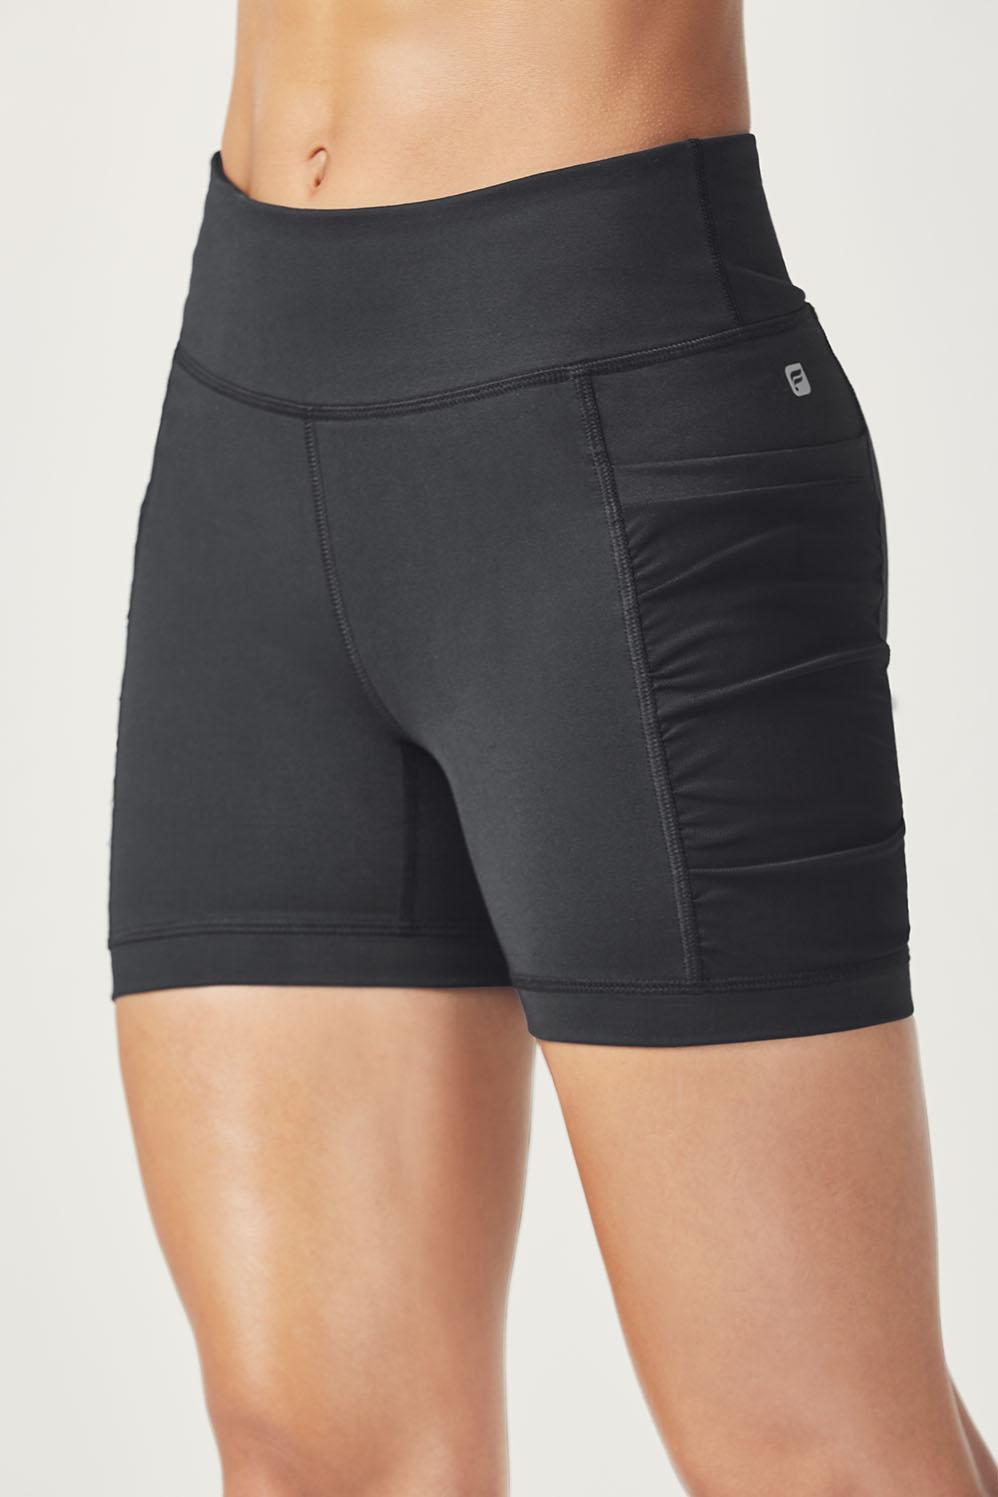 Short lindy en noir v tements de sport fabletics for 998 haute compression